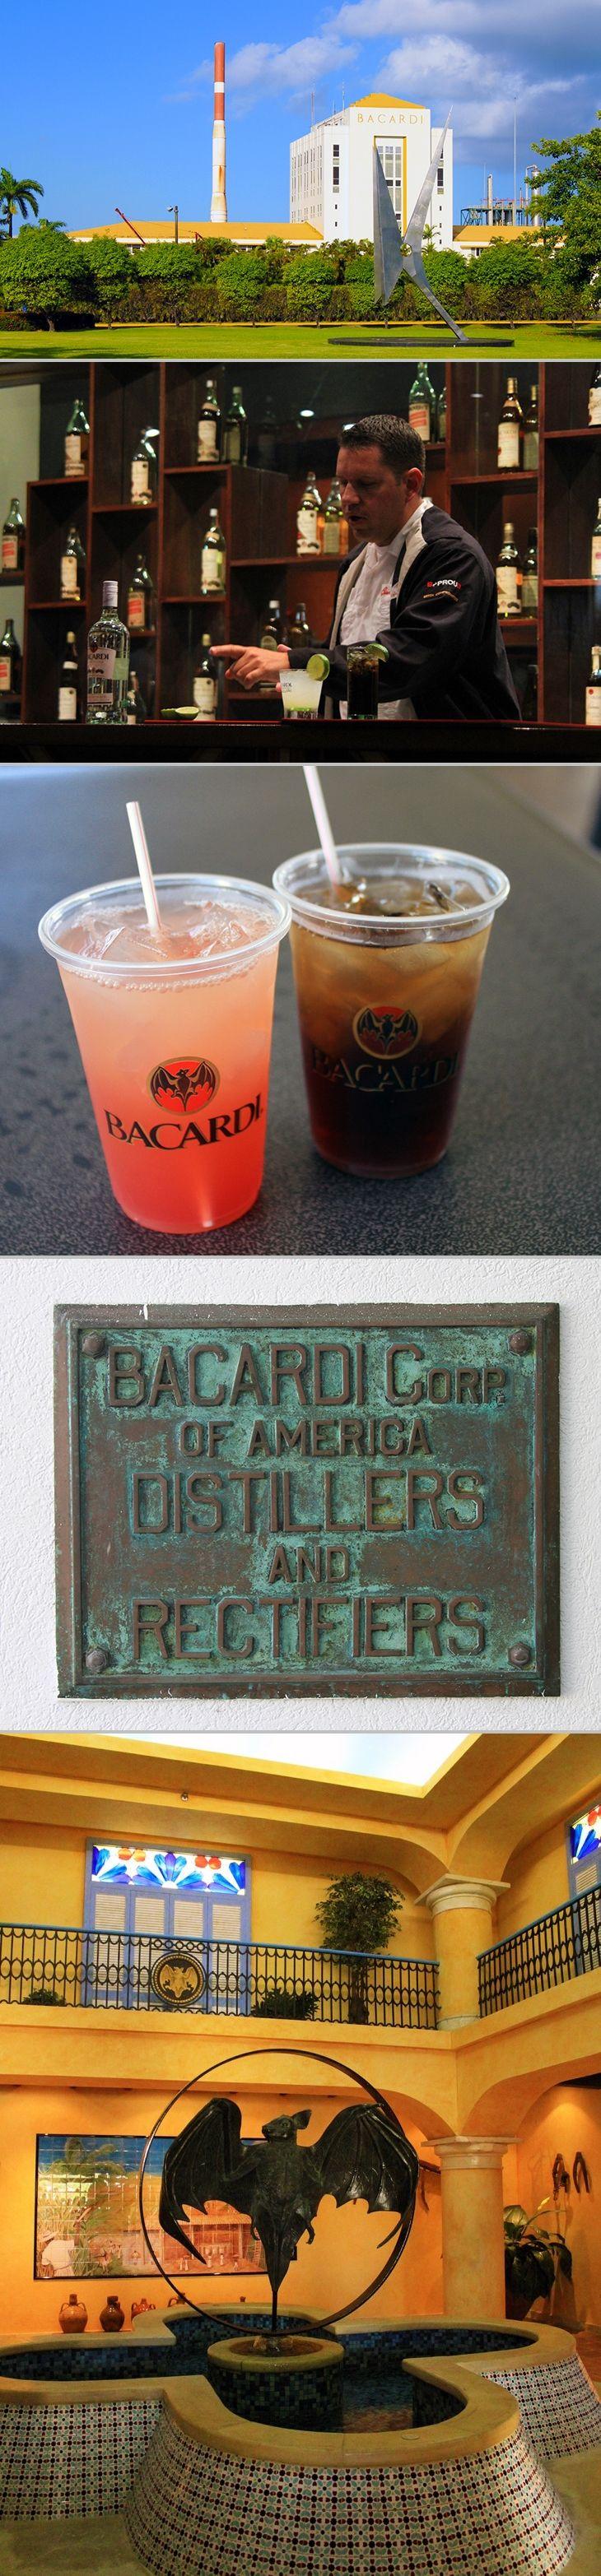 Casa BACARDI Tour in Puerto Rico